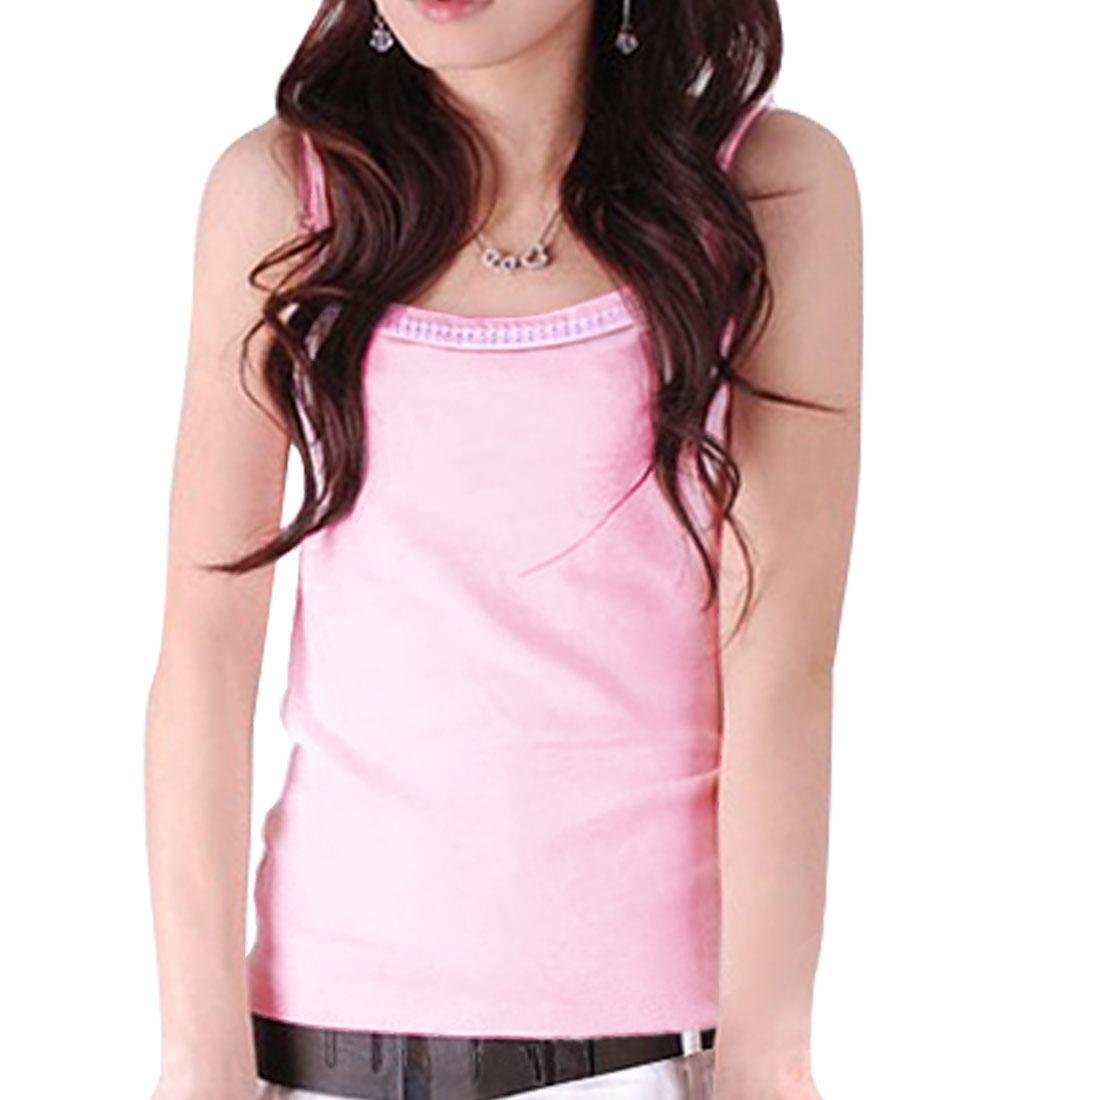 Woman Square Neckline Spaghetti Strap Summer Tank Top Pink XS